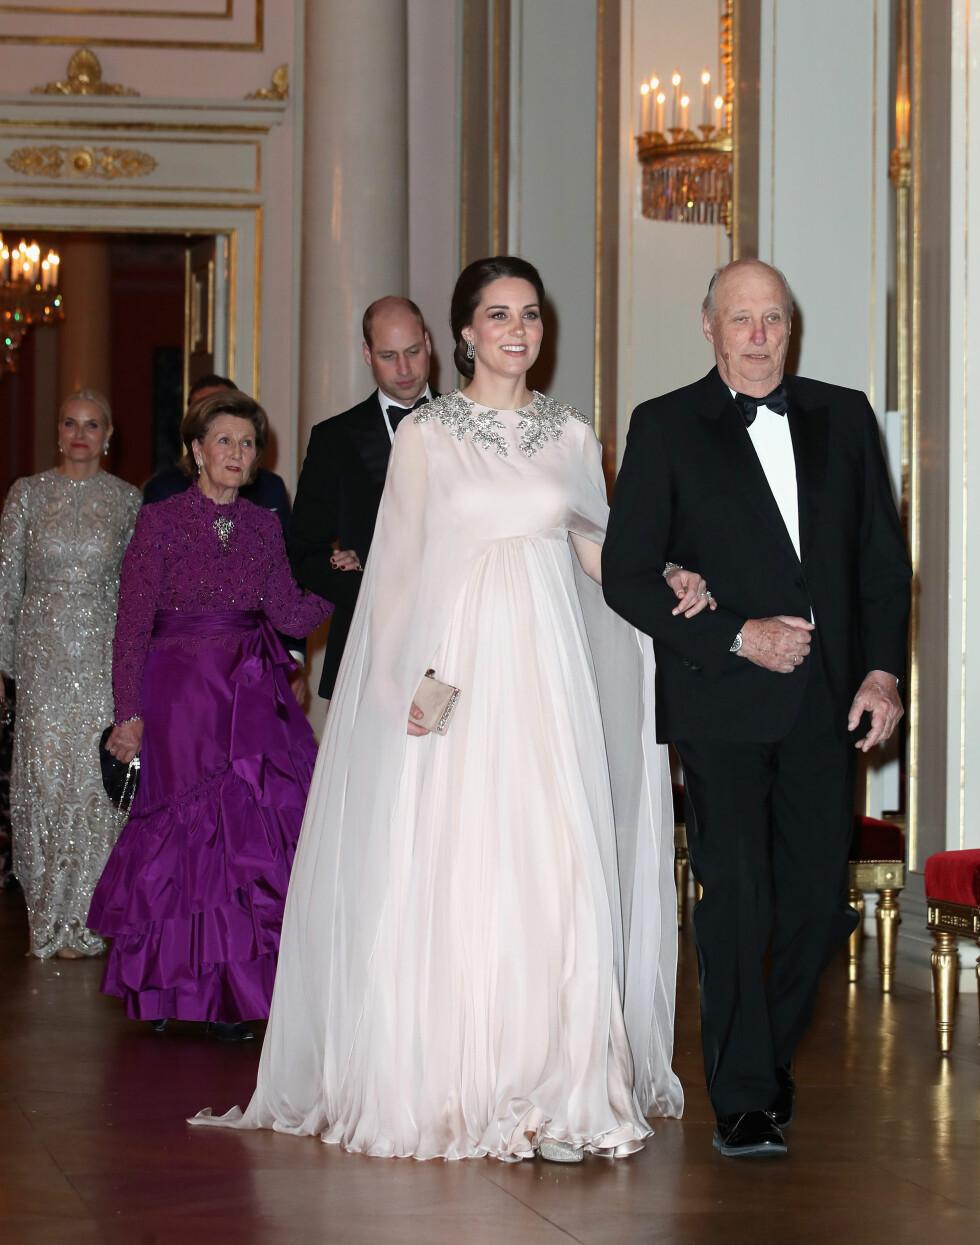 GALLA PÅ SLOTTET: Her ankommer hertuginne Kate gallaen på Slottet arm i arm med kong Harald. FOTO: NTB Scanpix